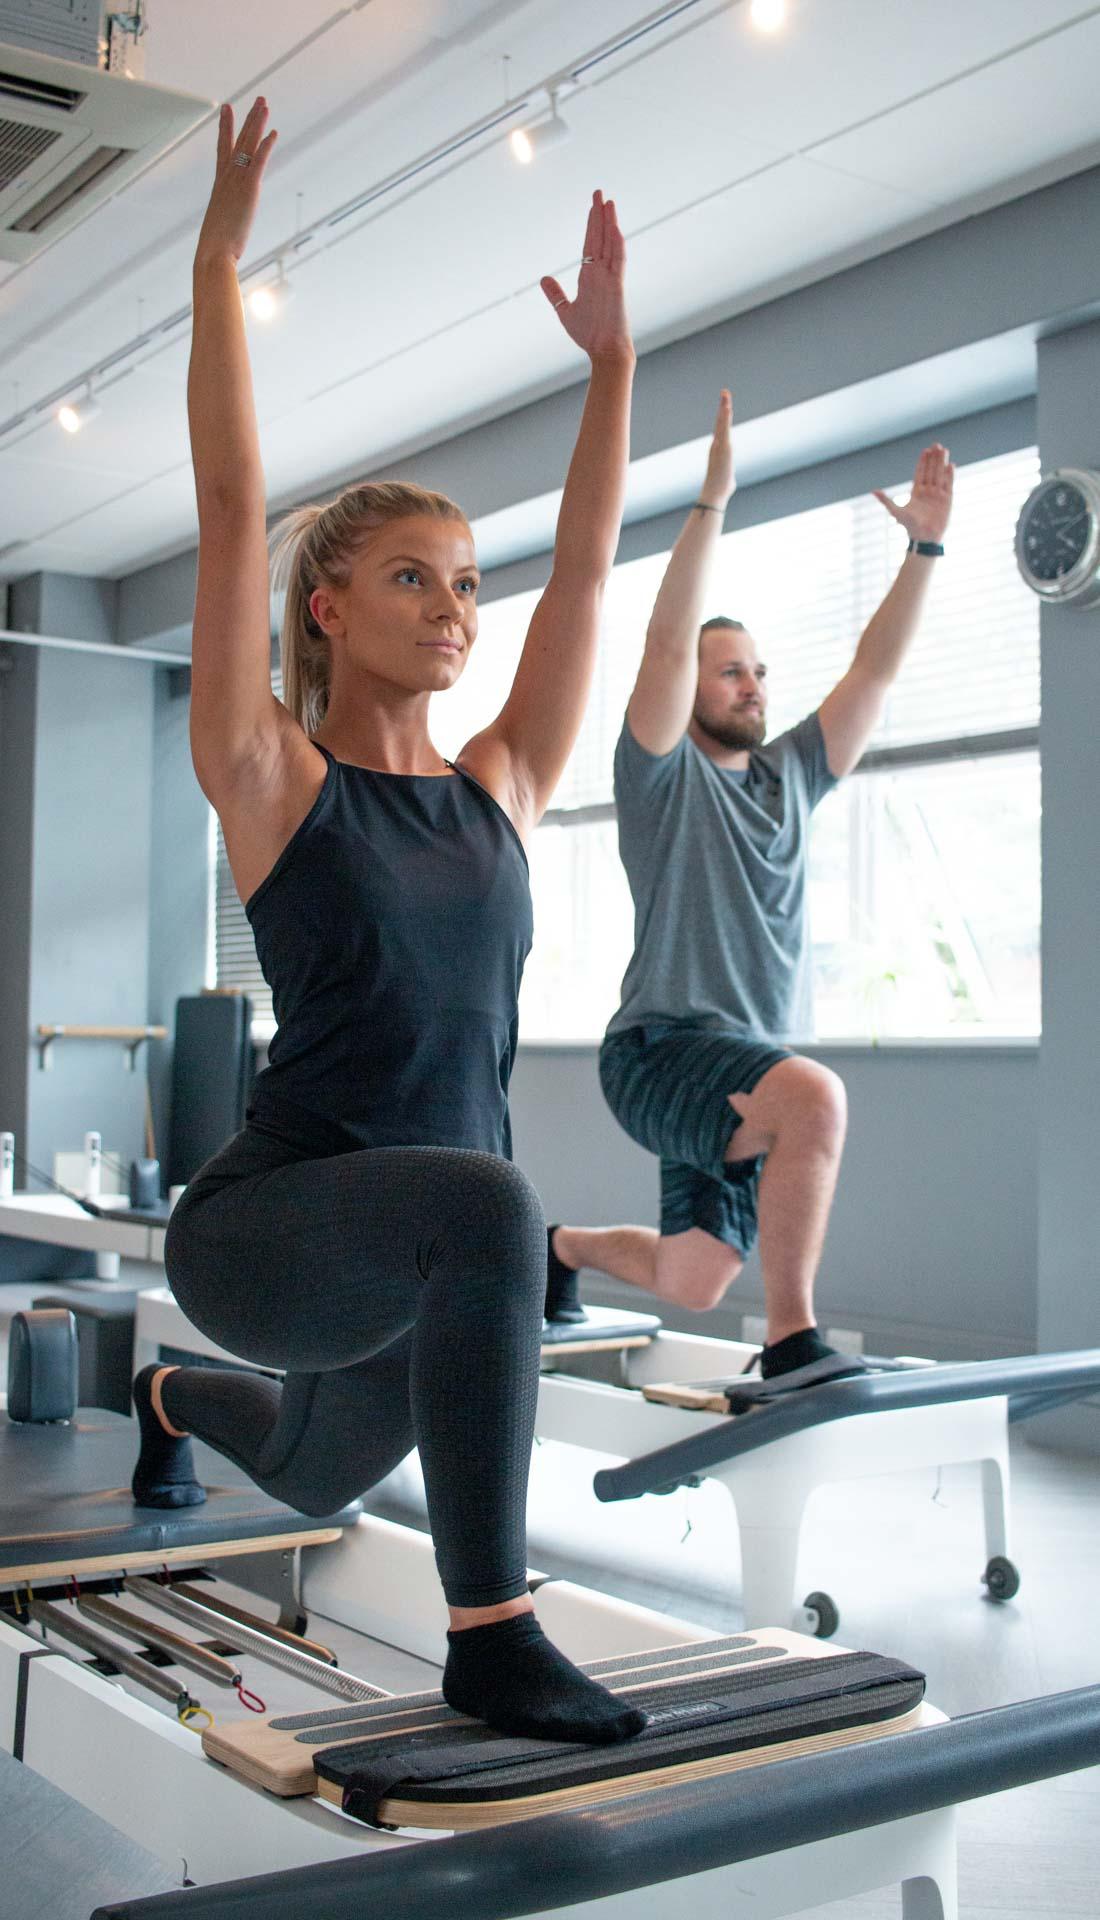 Pilates class at the gym. Fitness photographer uk, professional gym photographer Birmingham, fitness photoshoot birmingham